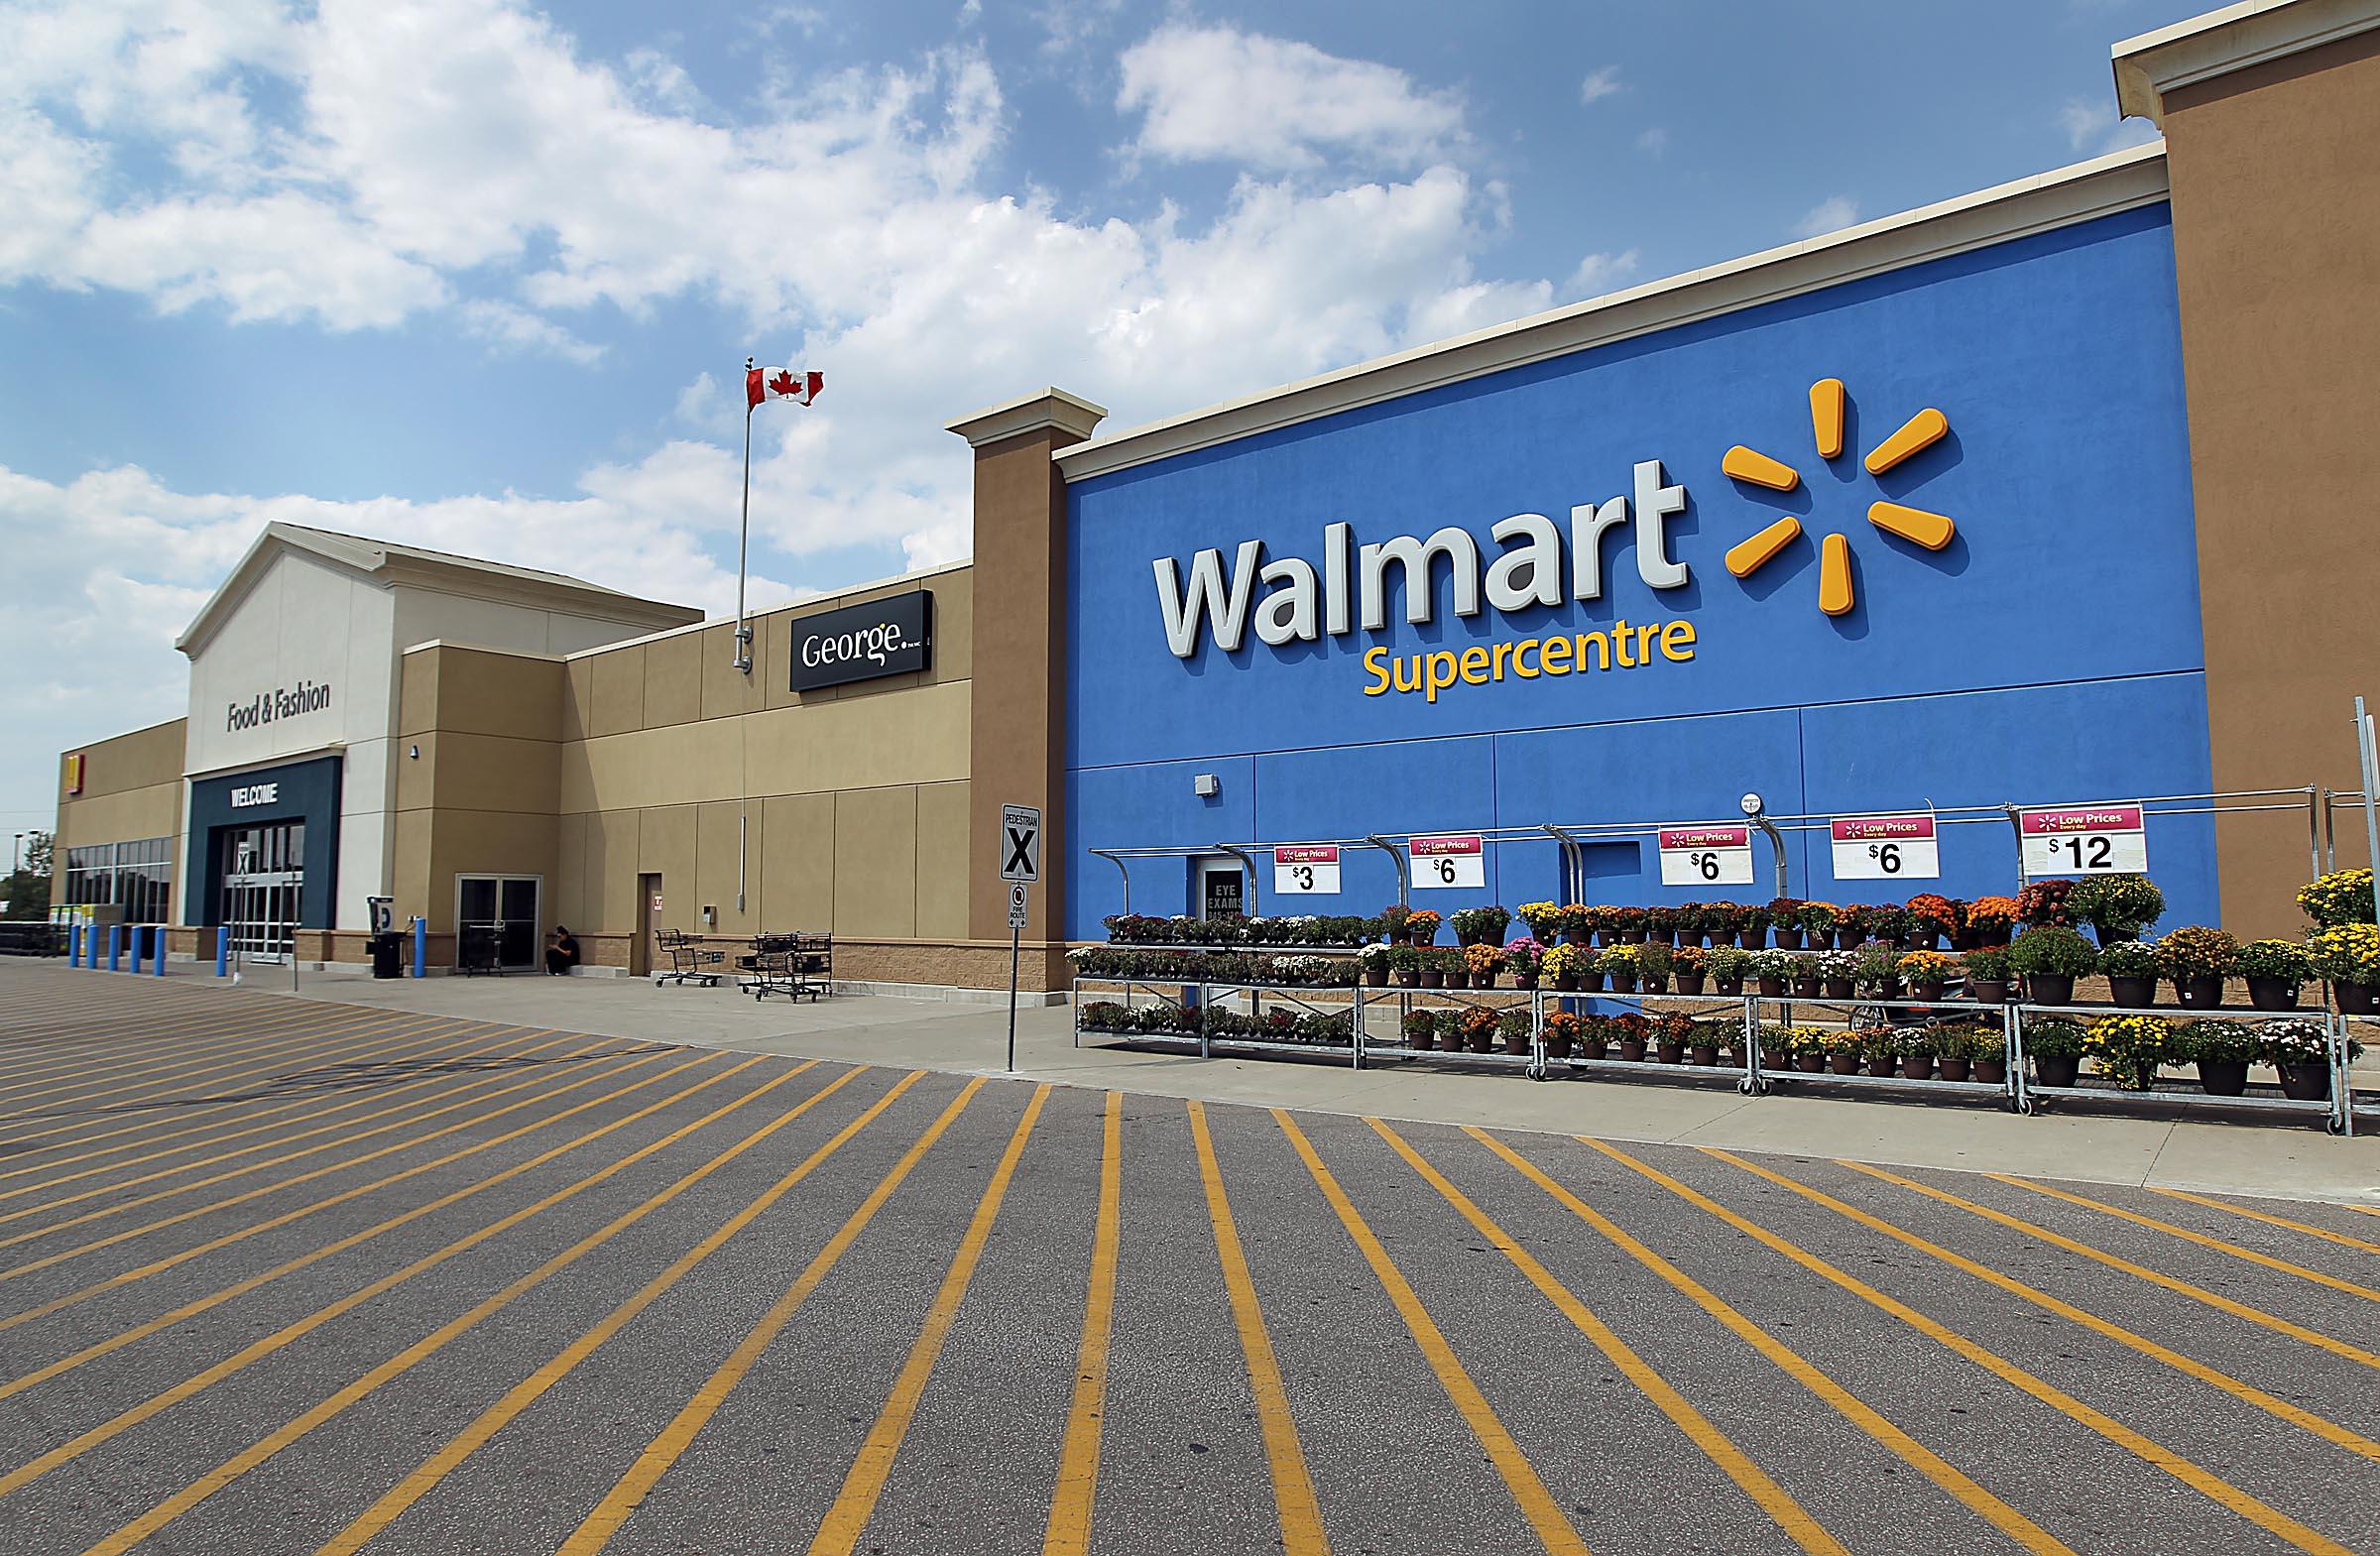 www.Survey.Walmart.com - Walmart In Store Satisfaction Survey